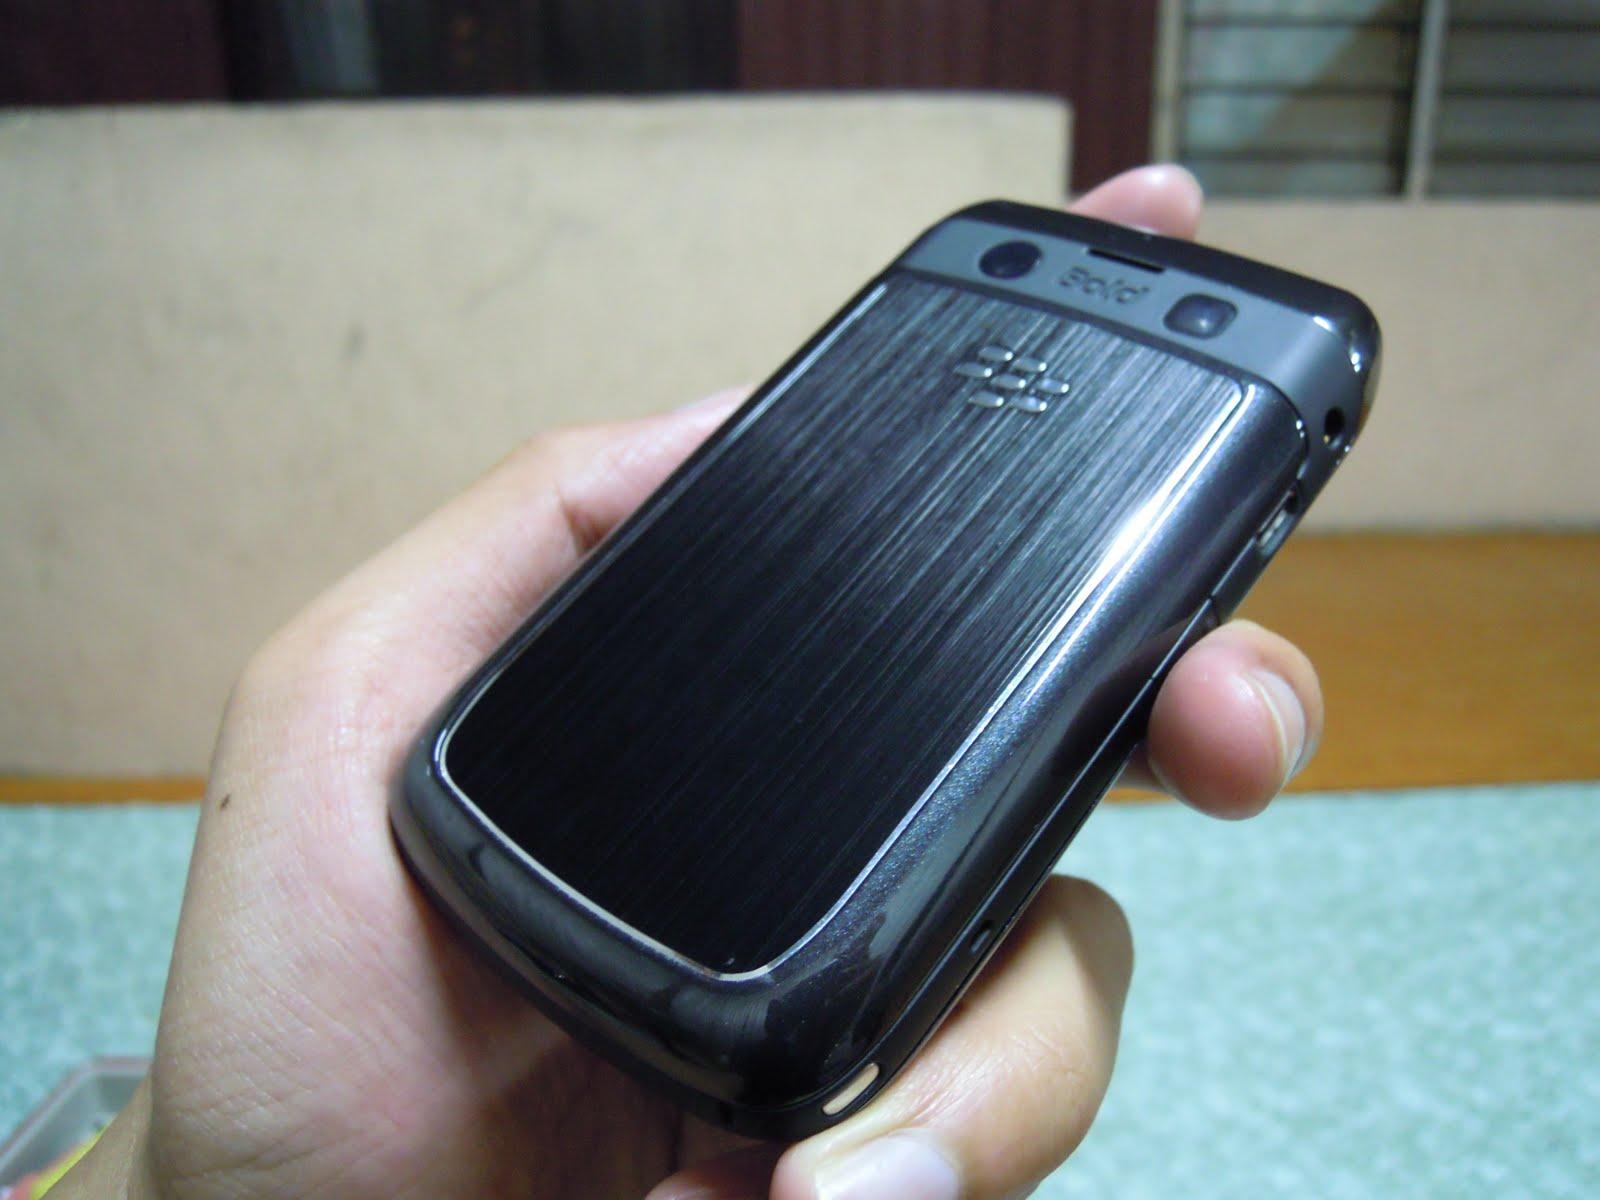 yujito accessories blackberry bold 9700 battery door. Black Bedroom Furniture Sets. Home Design Ideas